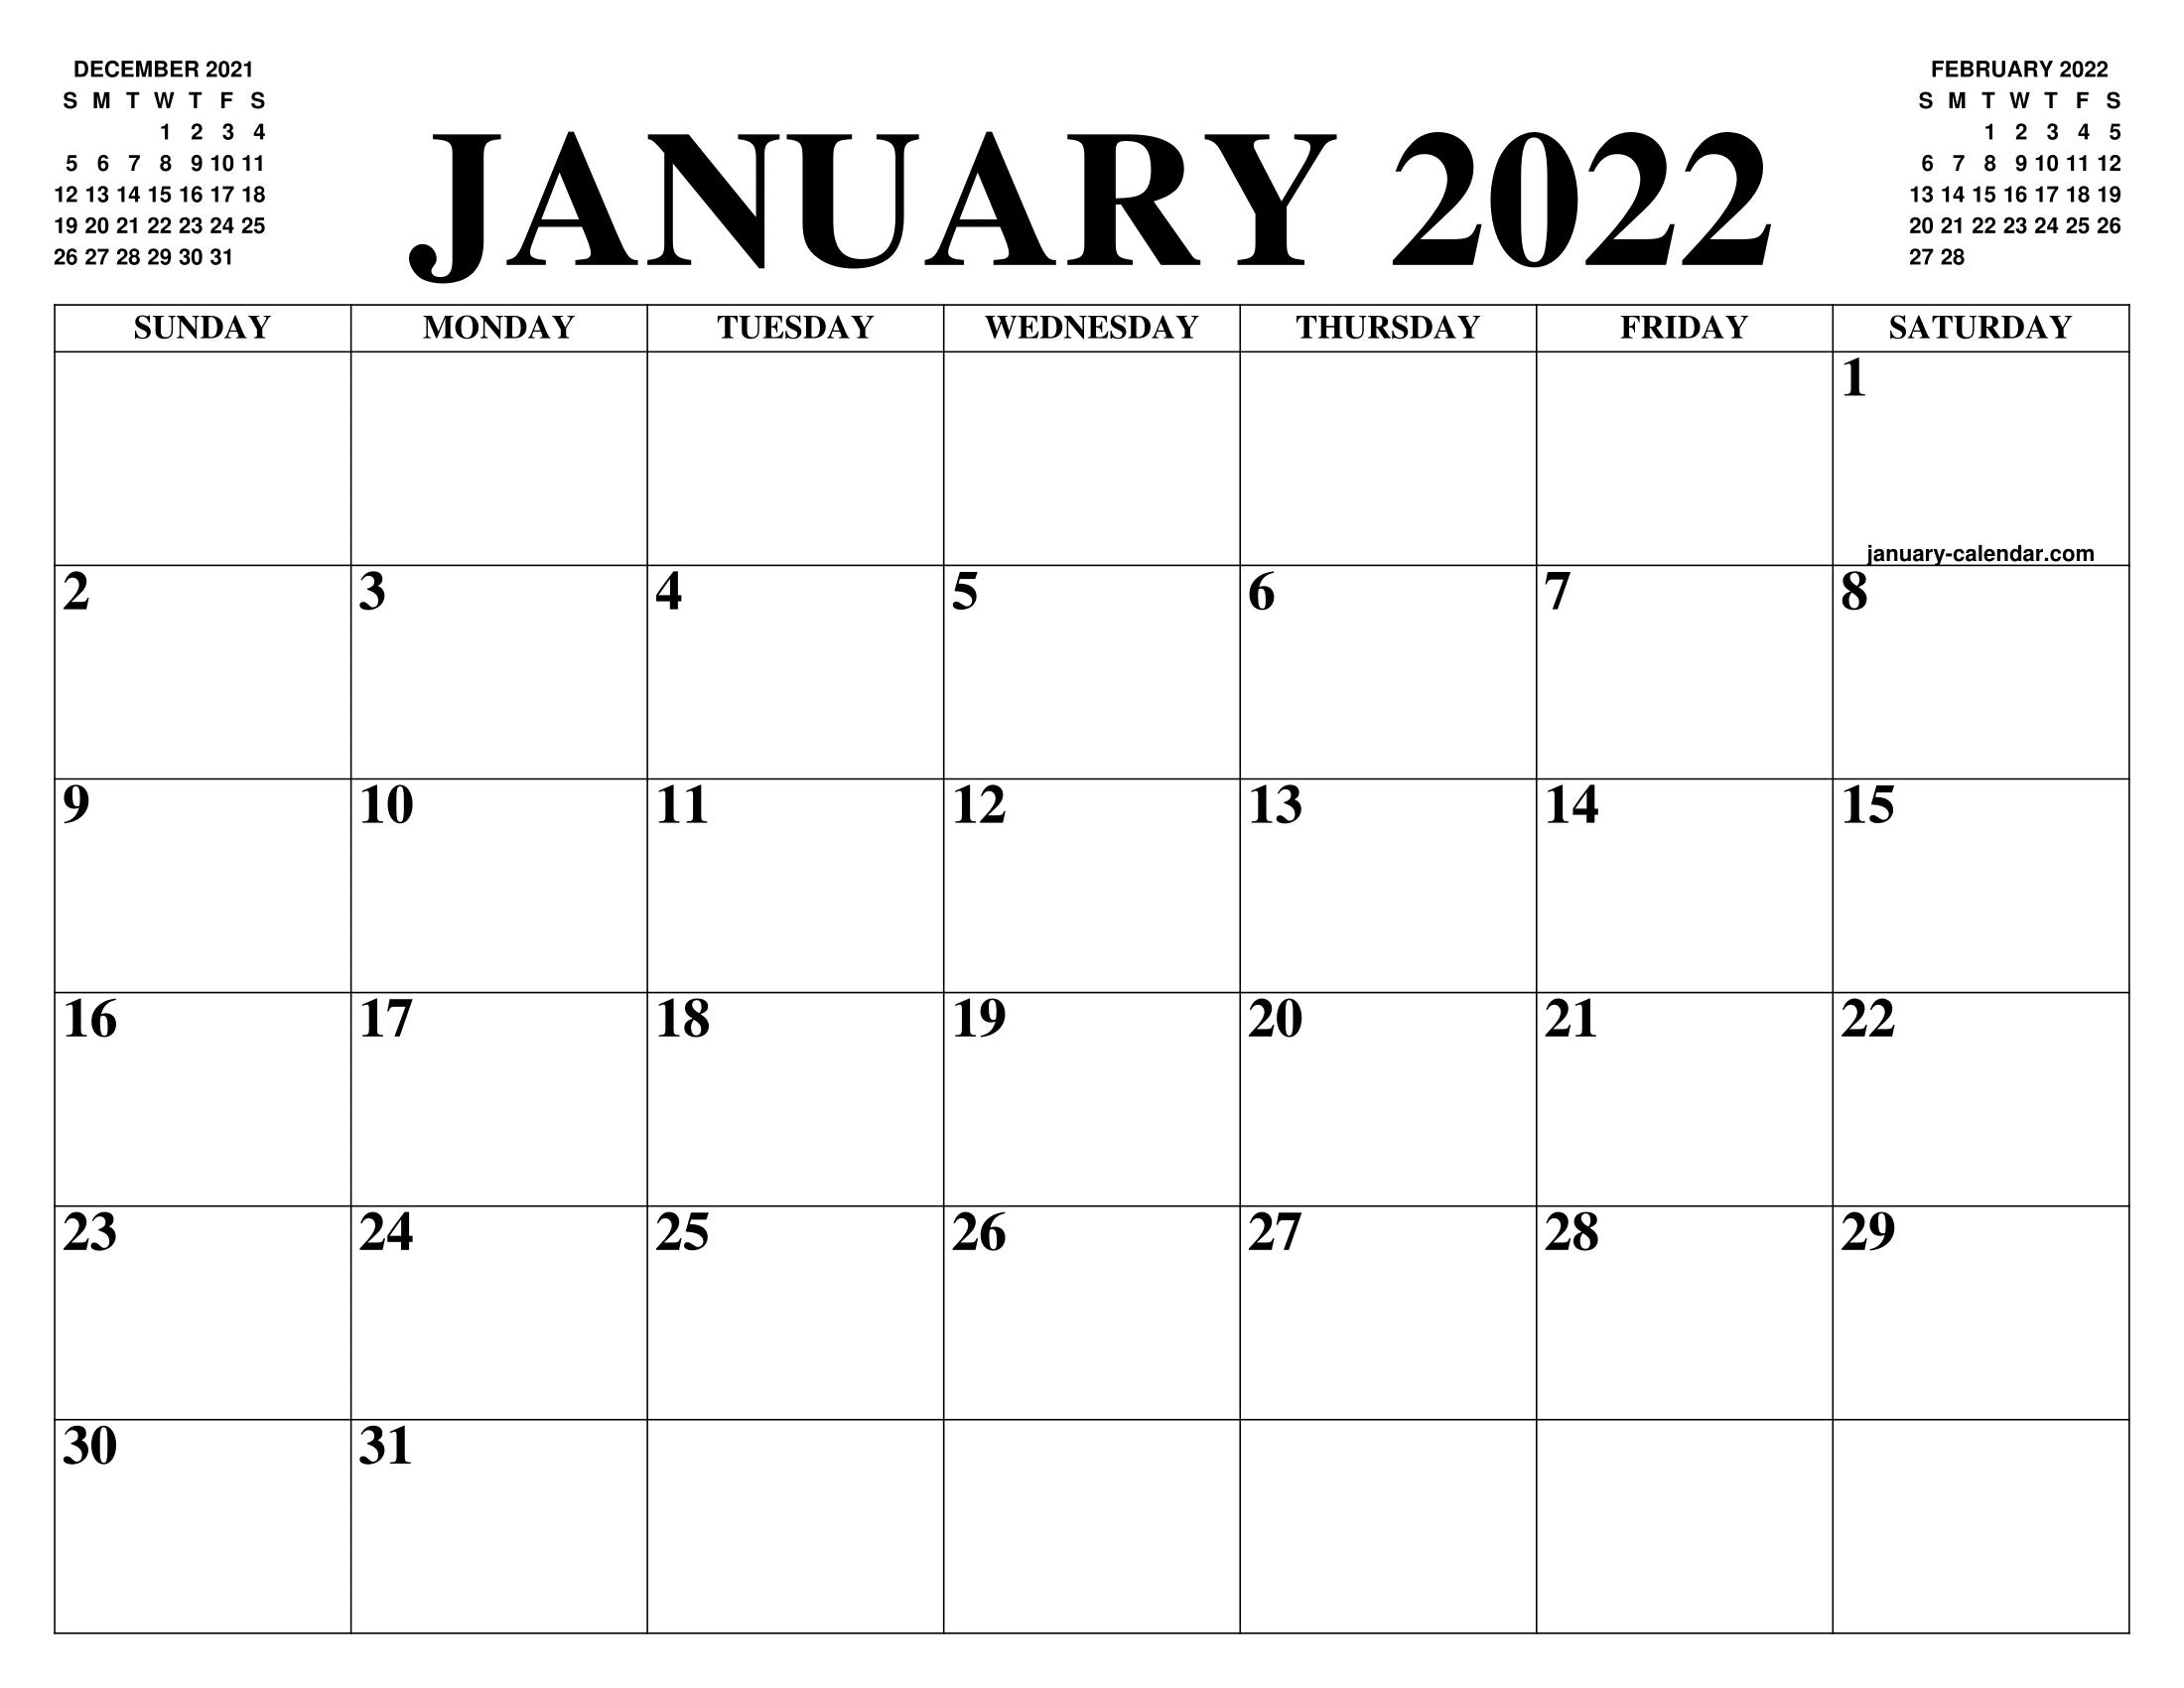 Calendar For Jan 2022.January 2022 Calendar Of The Month Free Printable January Calendar Of The Year Agenda